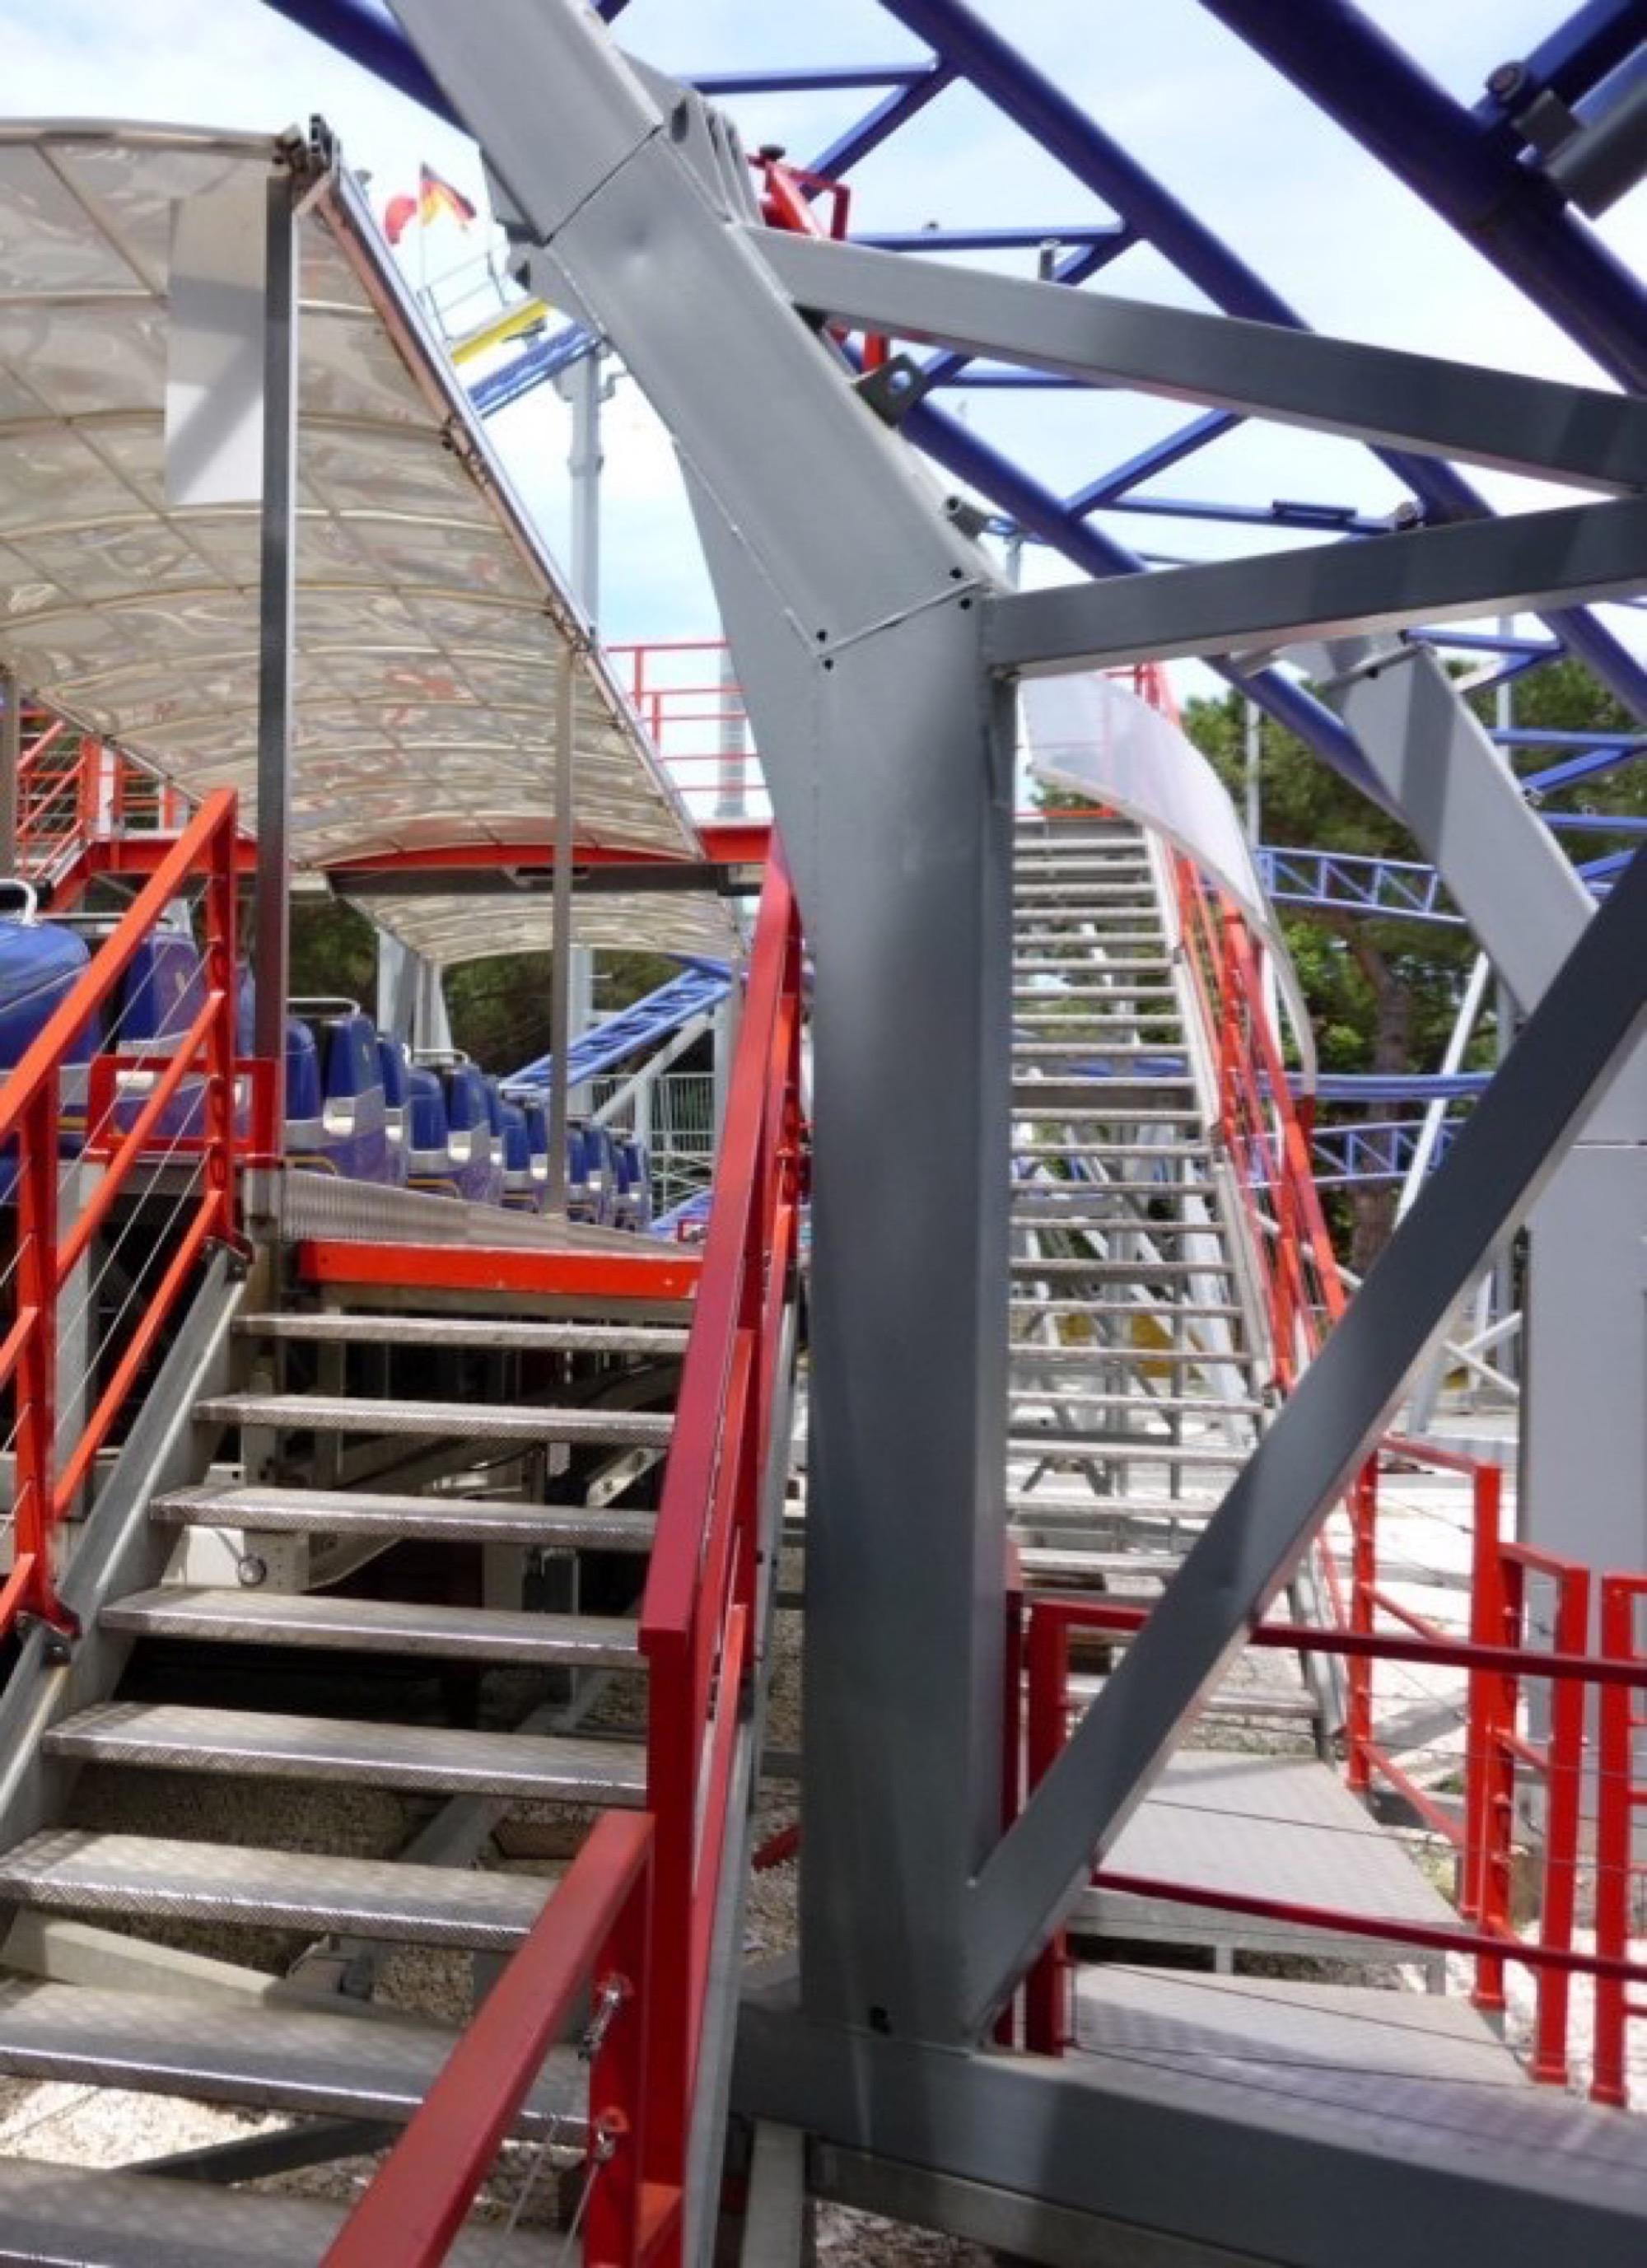 ROCK'N ROLL - Technical Park - Amusement Rides and amusement rides